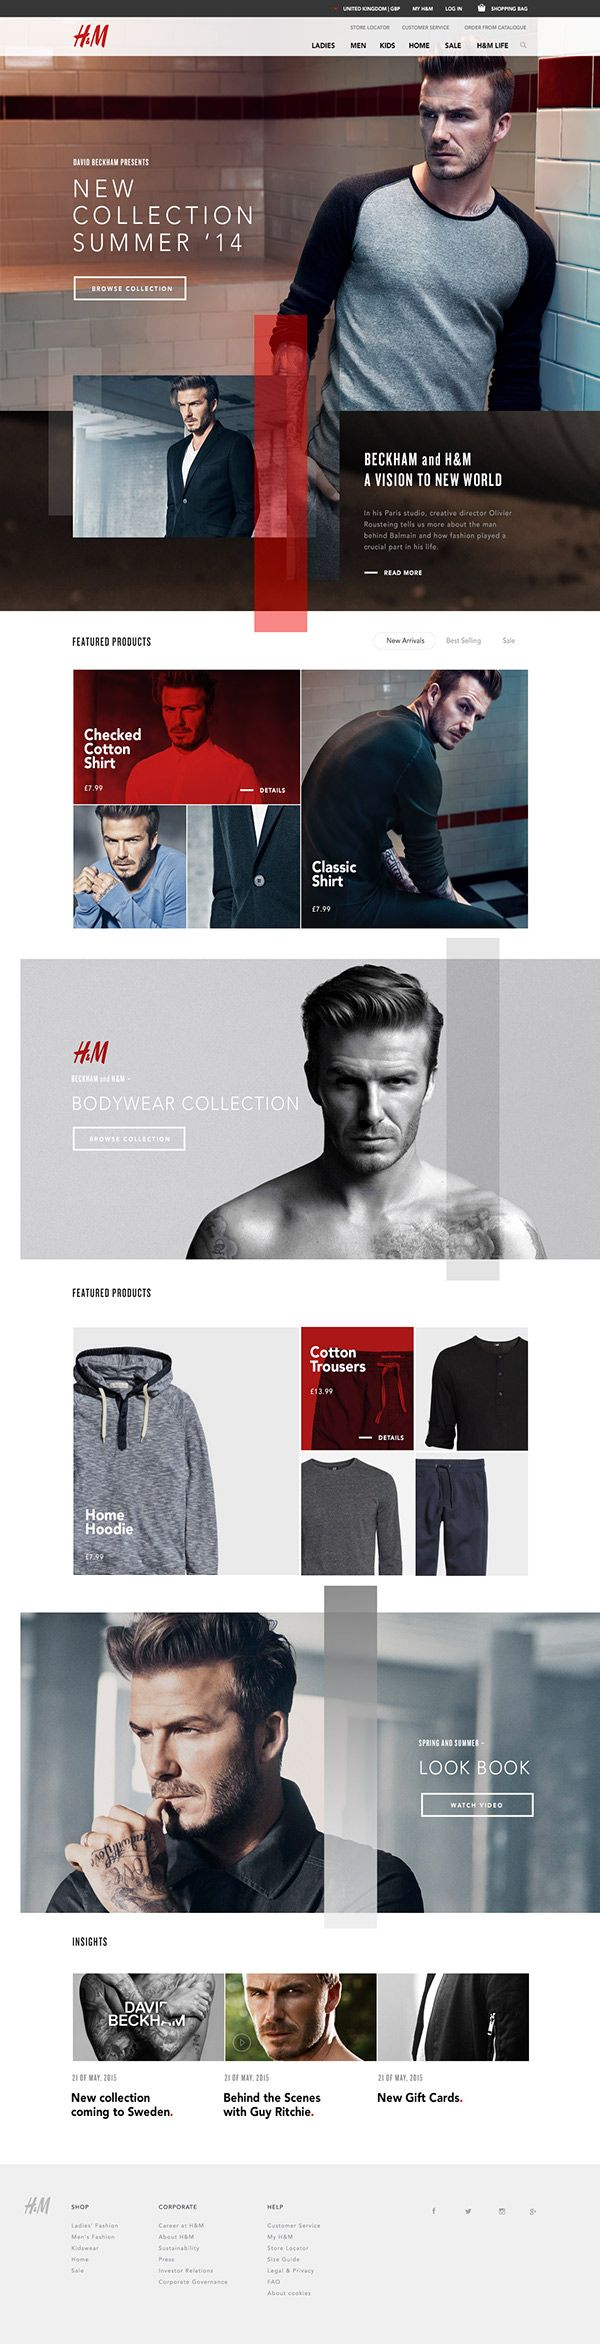 web dfesign | H&M X Beckham